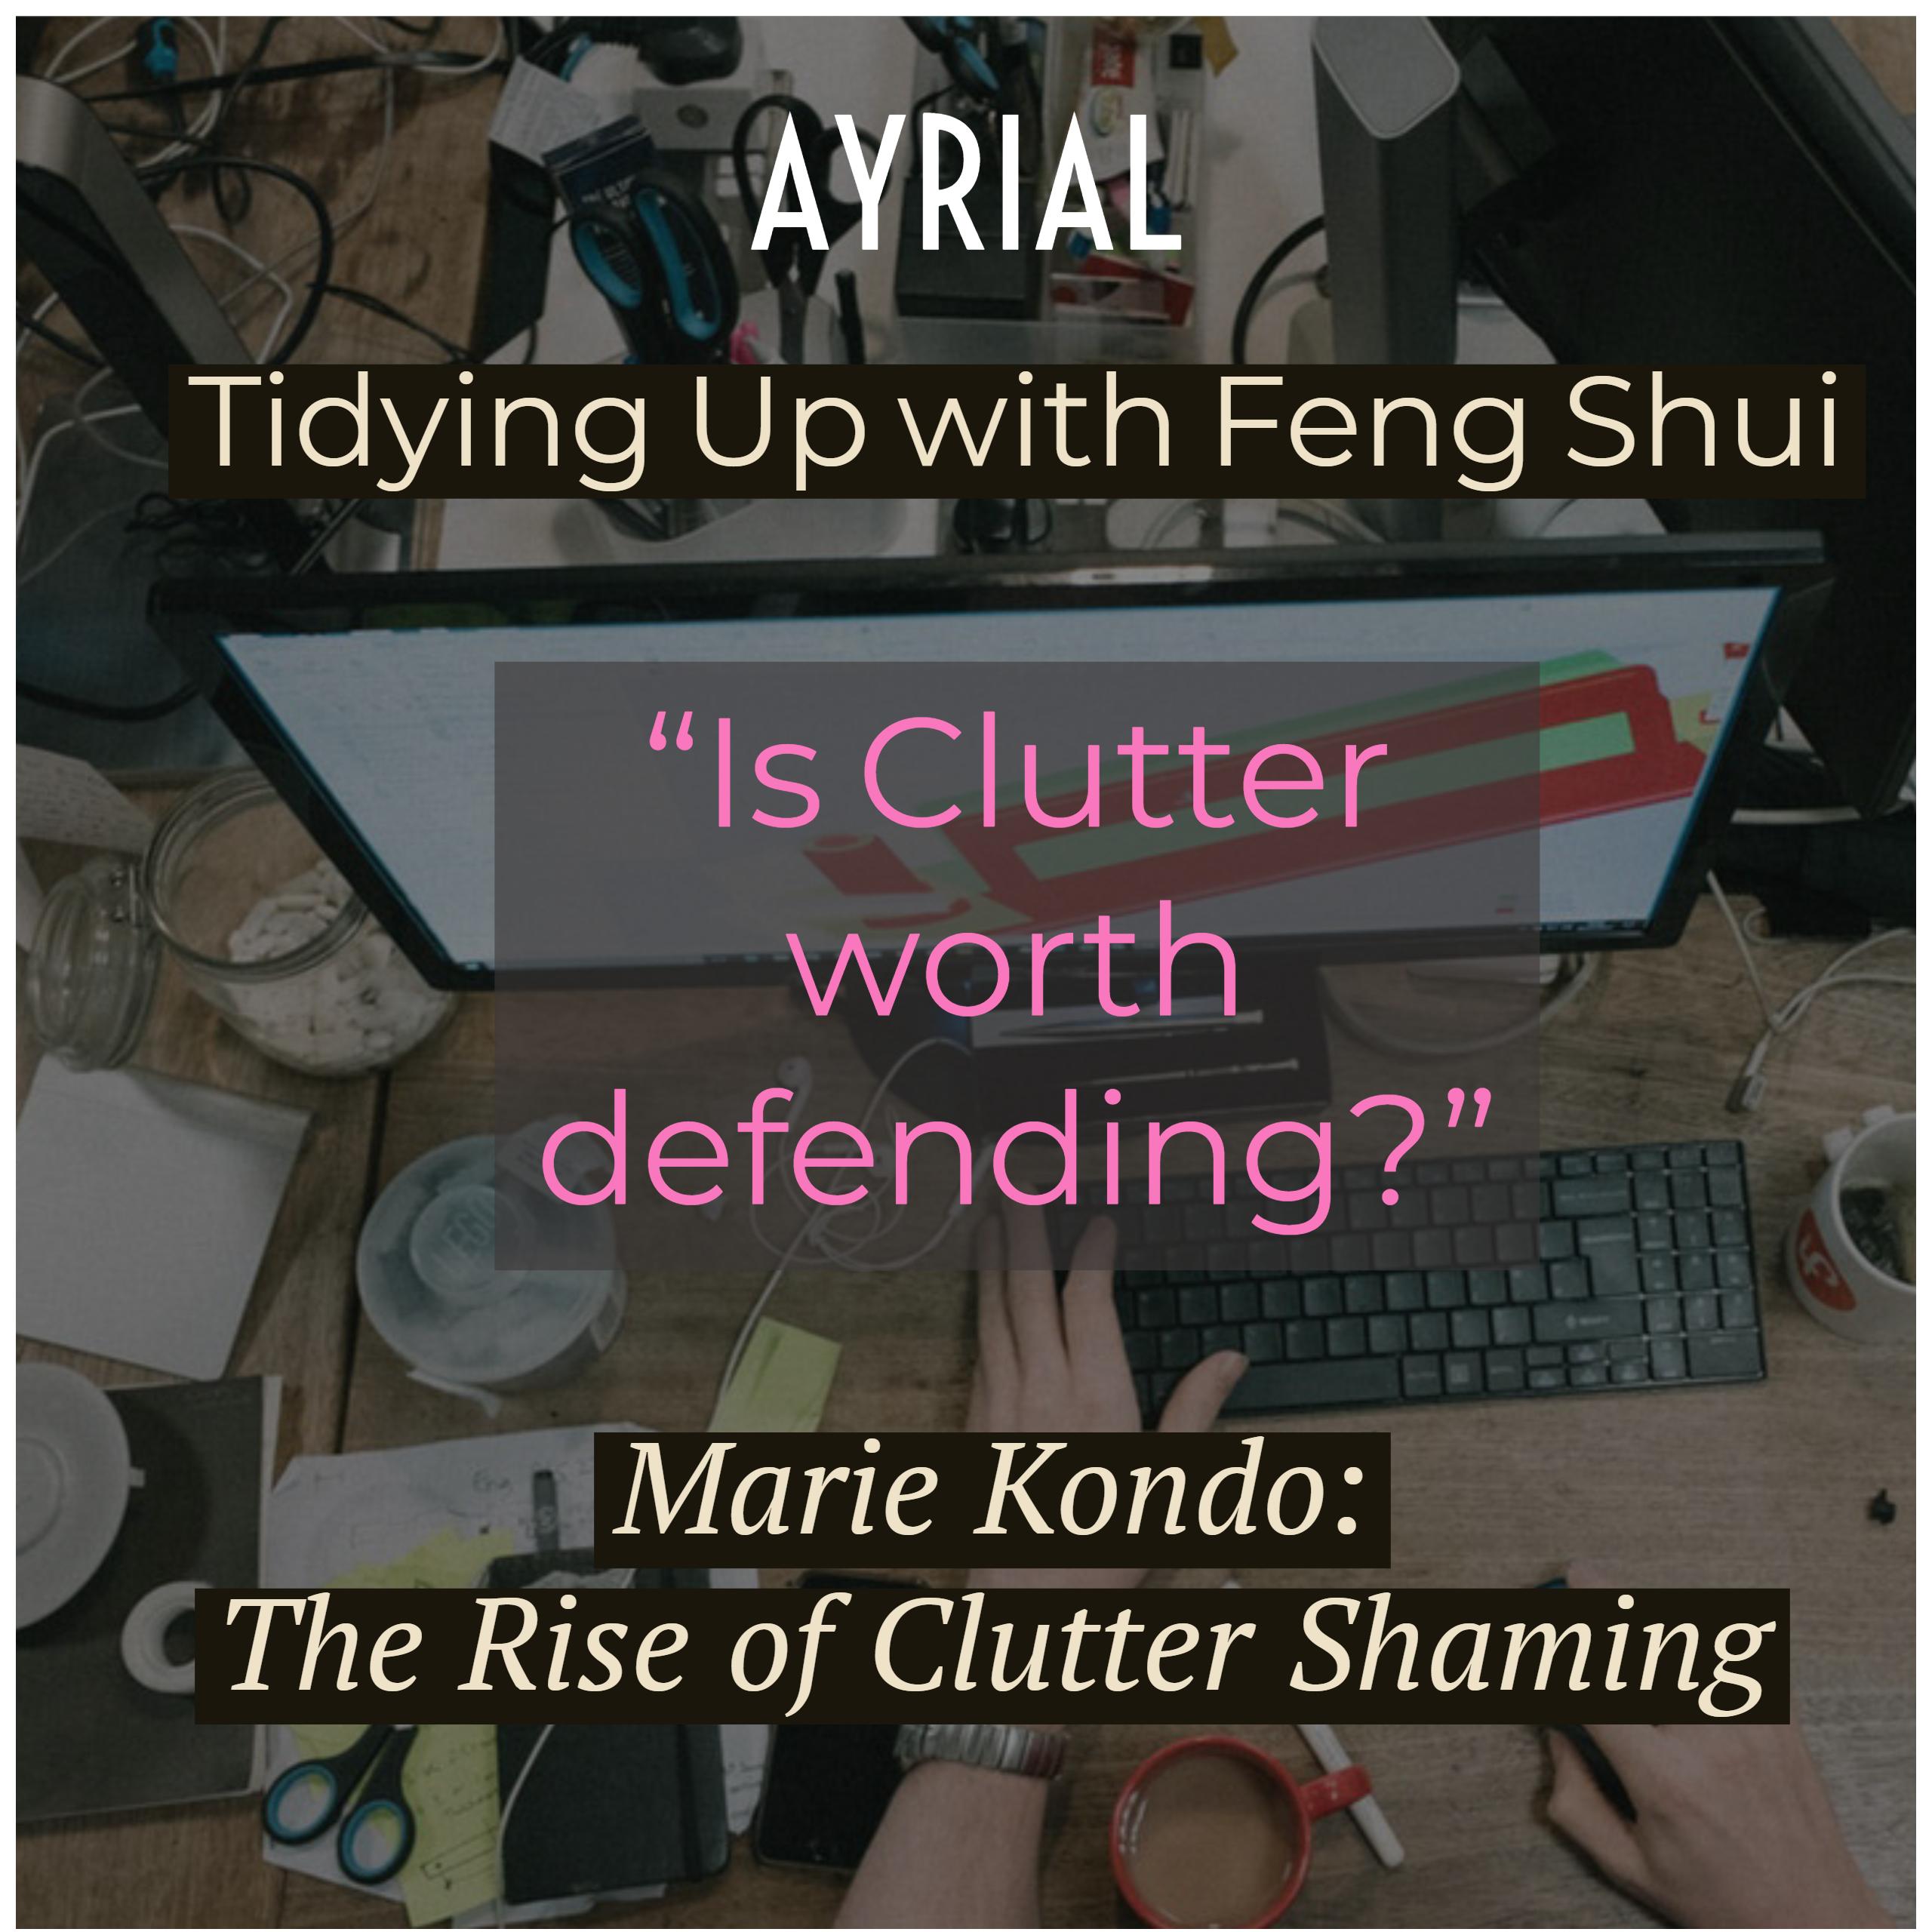 Marie Kondo: Tidying Up Netflix Series